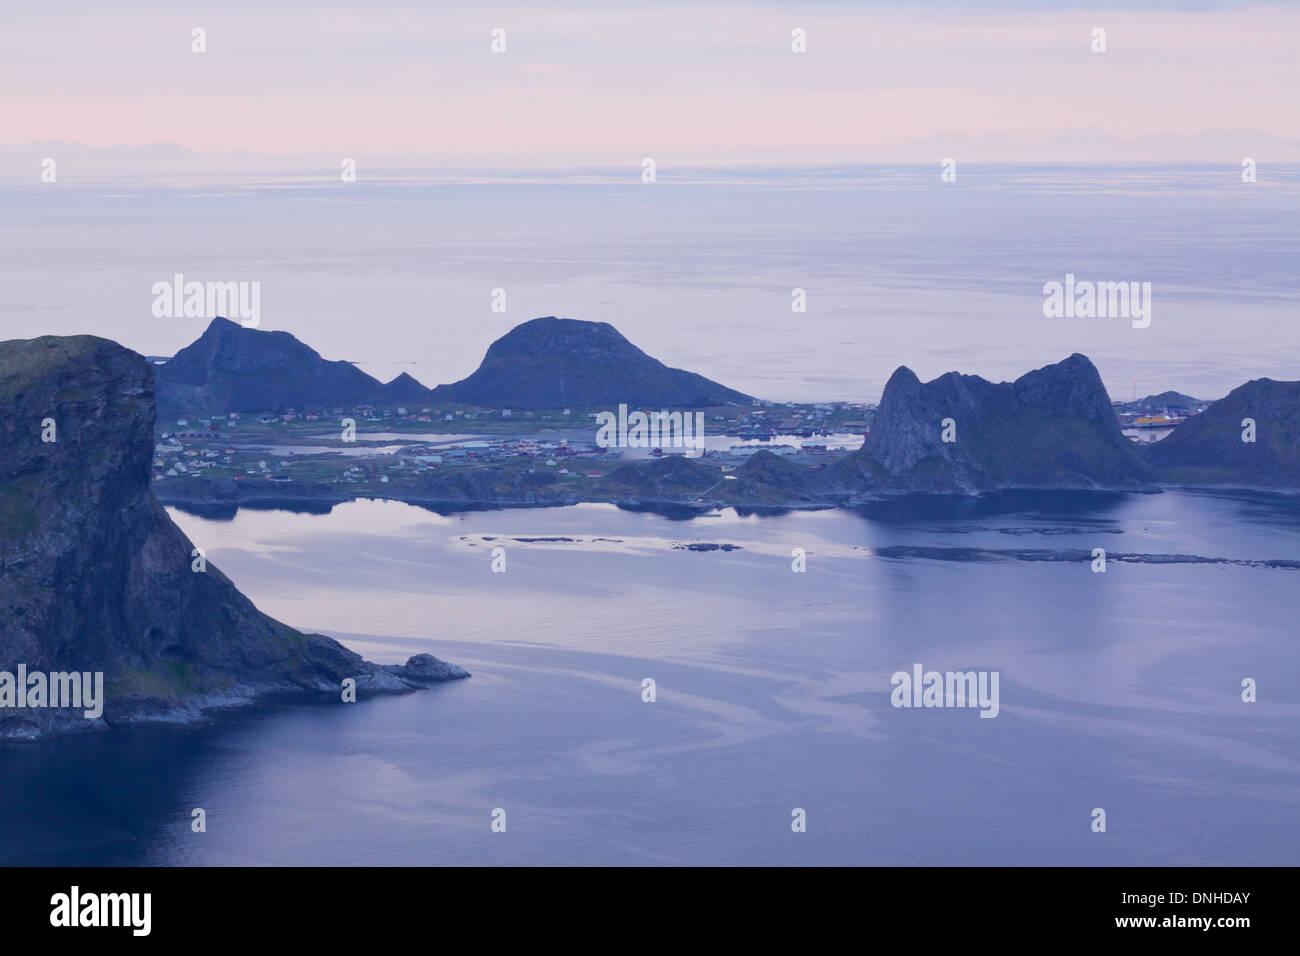 Fishing port Sorland on remote island of Vaeroy on Lofoten, Norway during night in summer - Stock Image